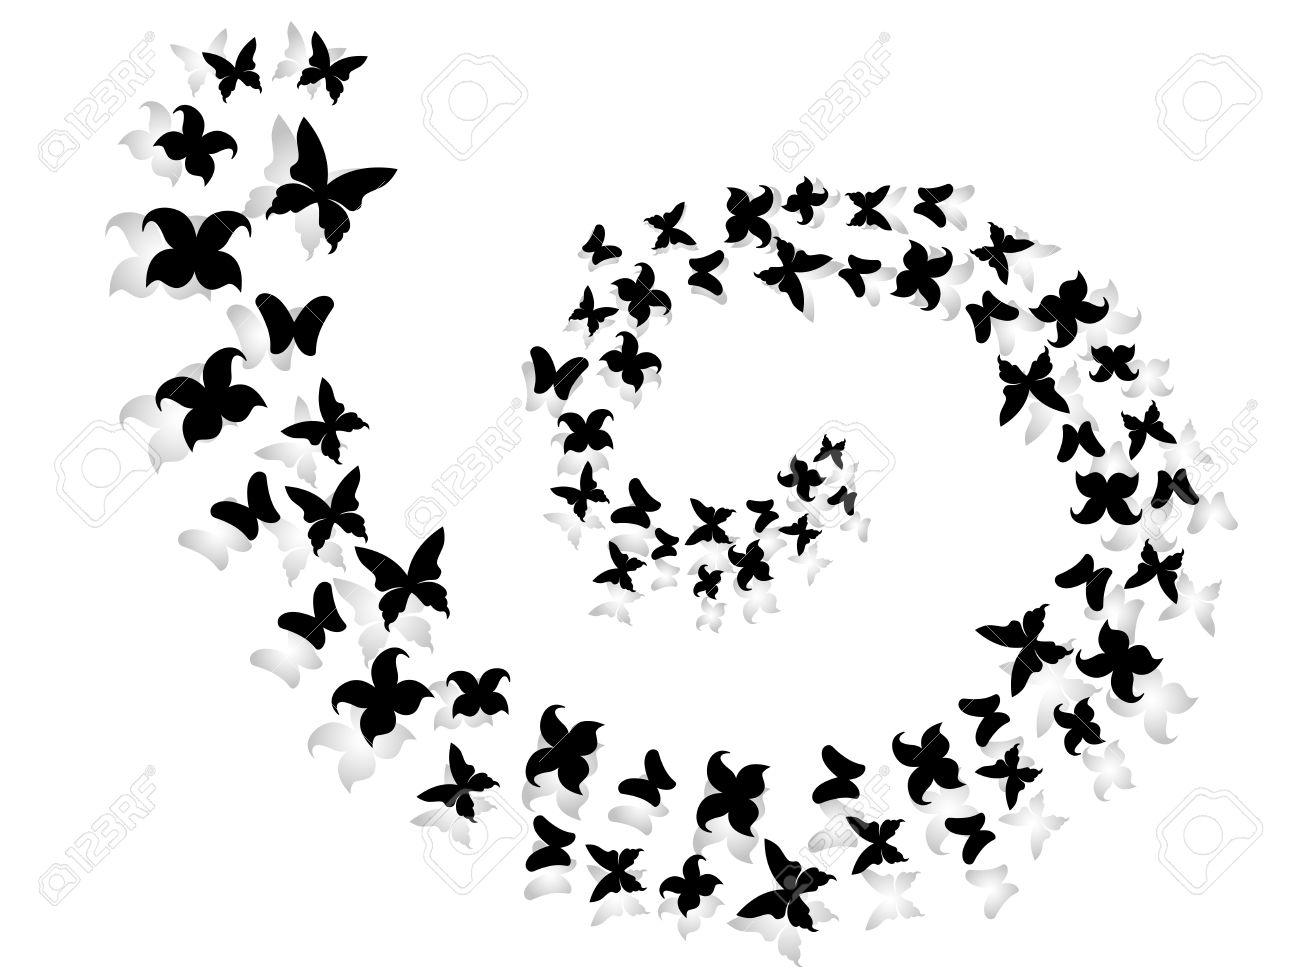 Spiral Of Black And Gray Flying Butterflies Hand Drawing Vector  -> Borboleta Vetor